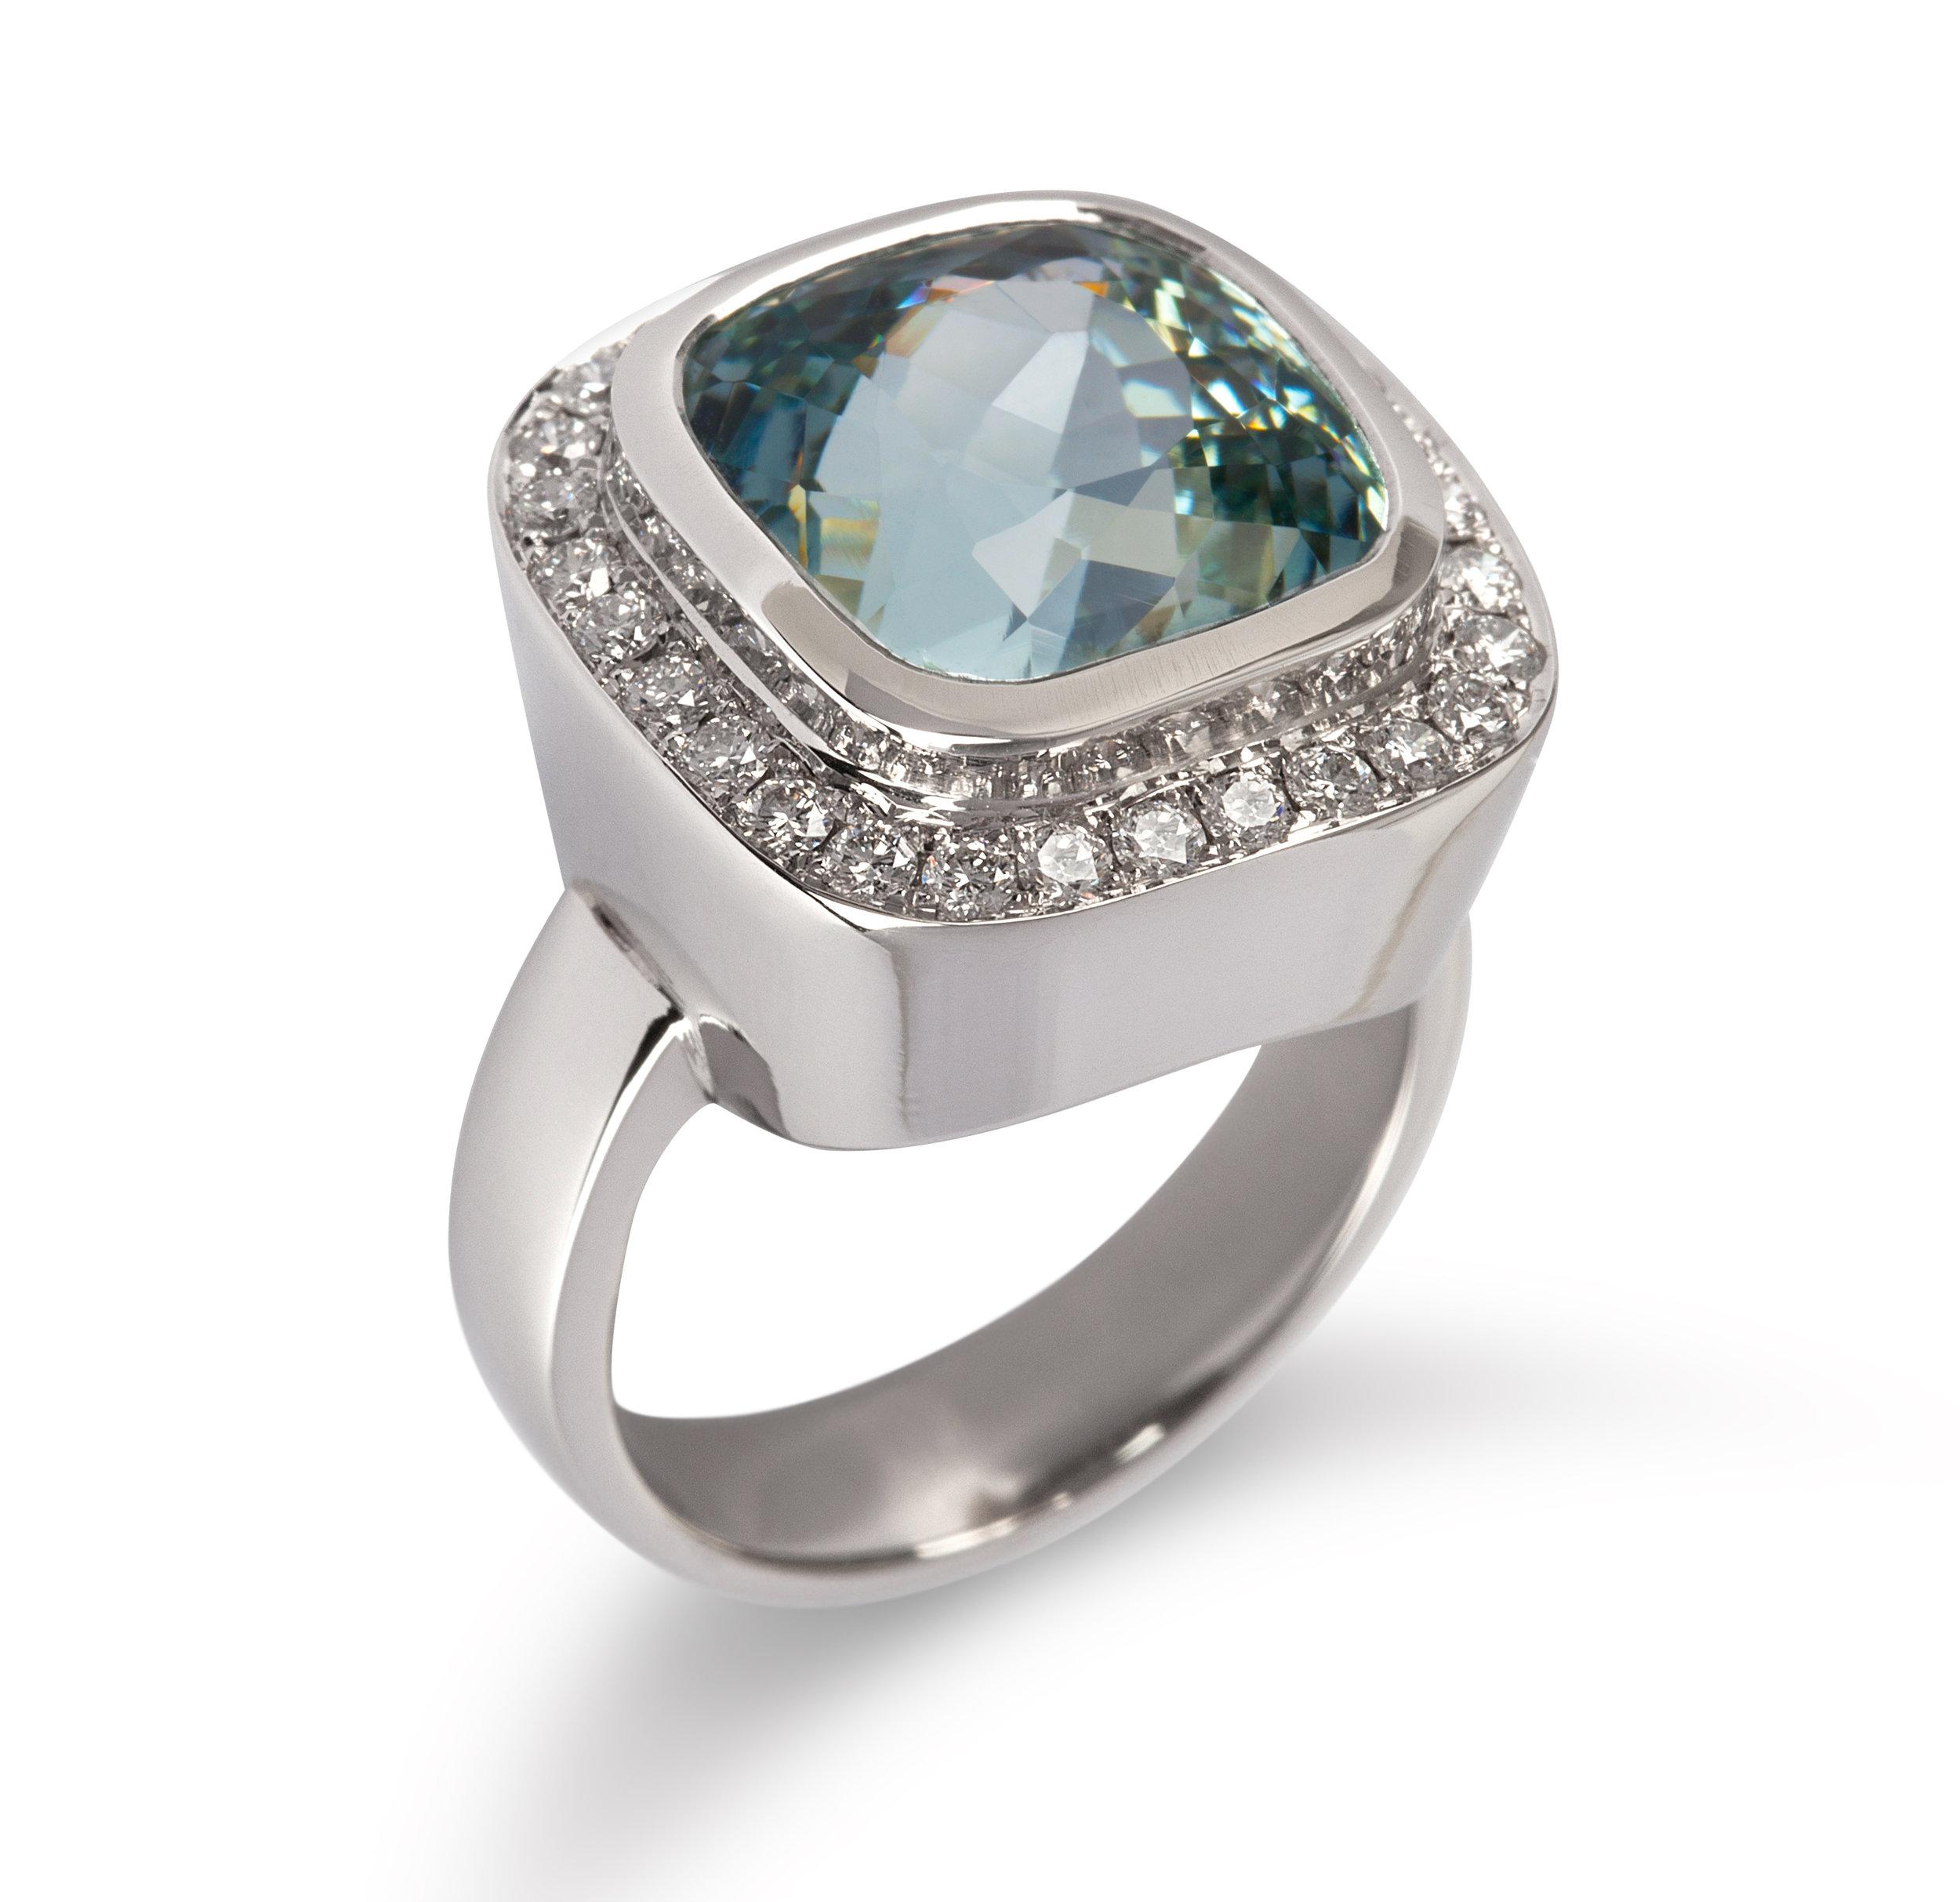 Aquamarine, Diamond, 18ct White Gold Ring Cropped.jpg